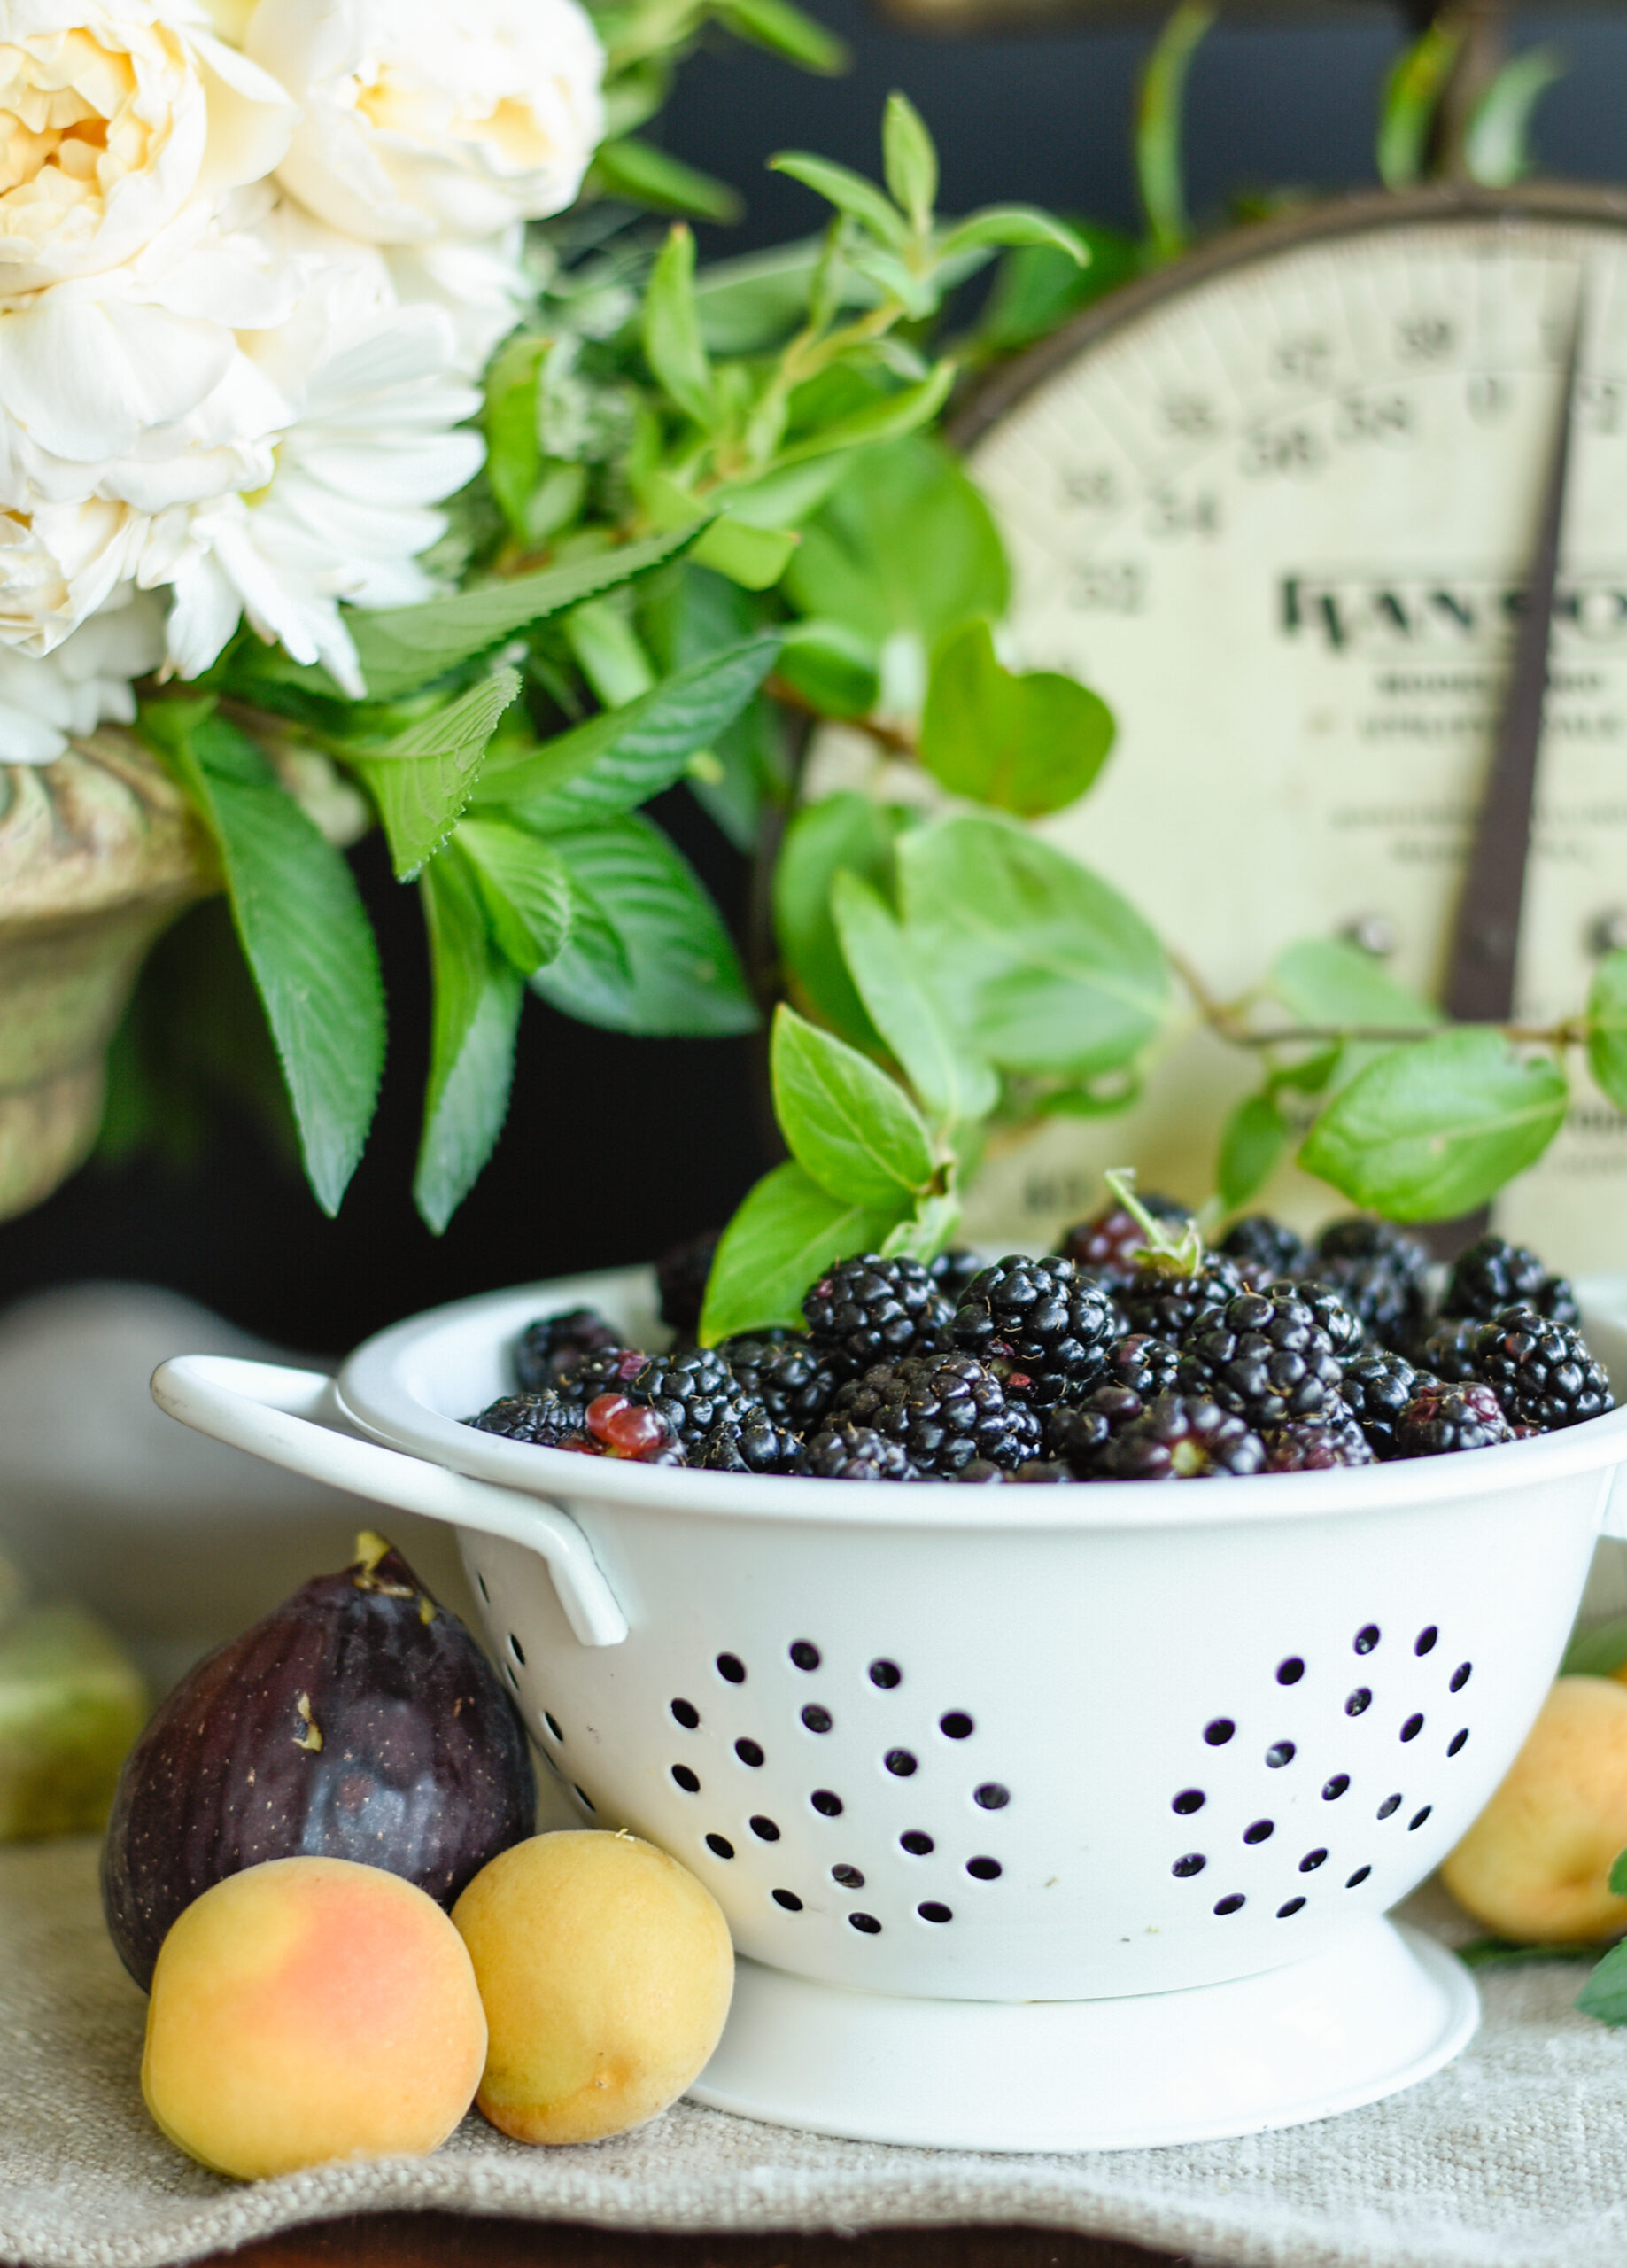 Blackberries The Prudent Homemaker